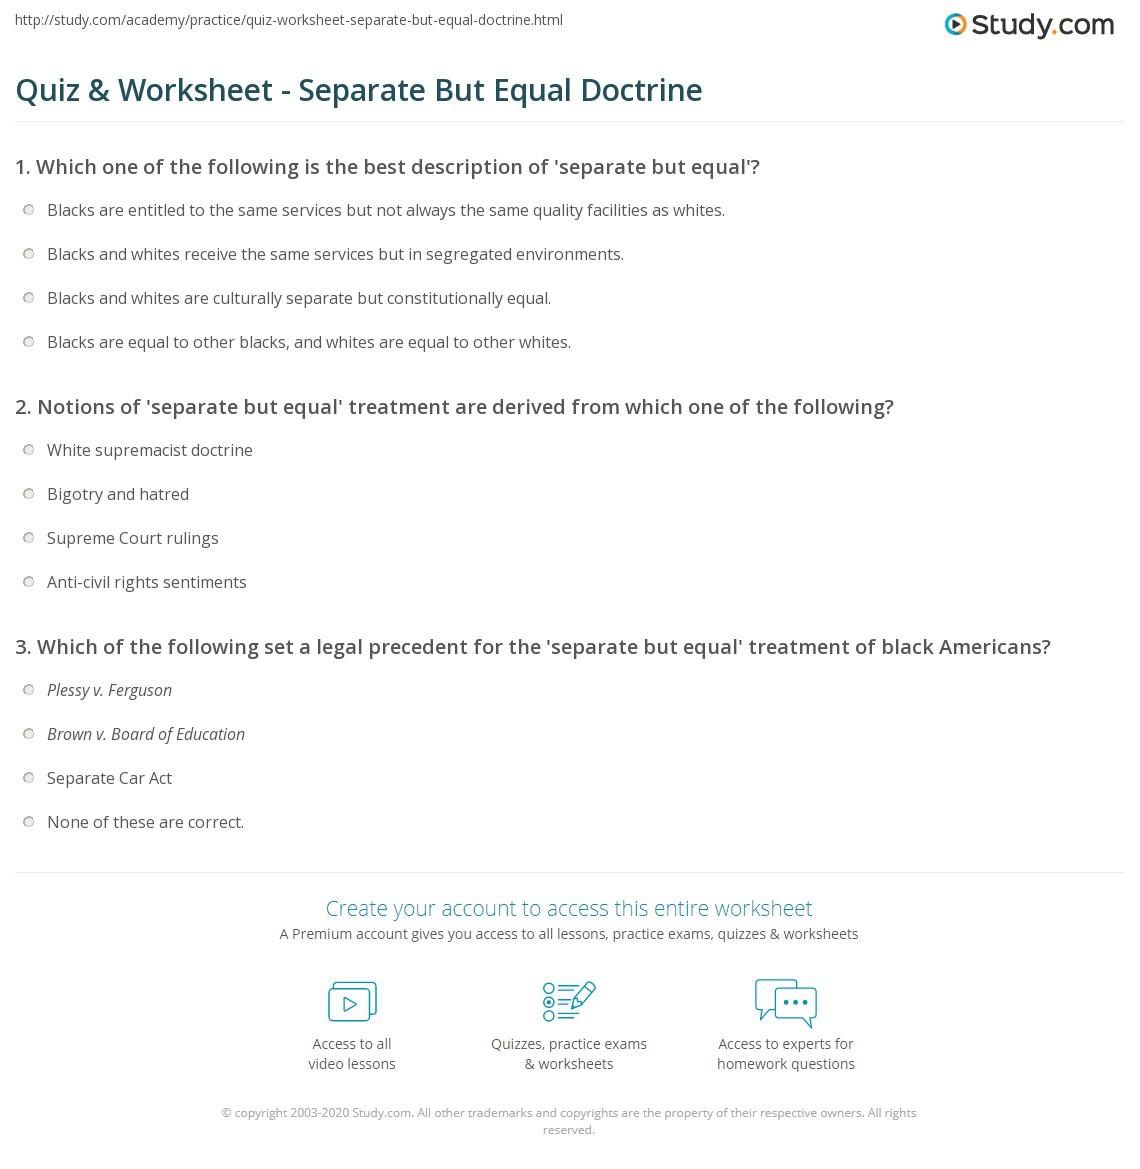 Quiz & Worksheet - Separate But Equal Doctrine | Study com